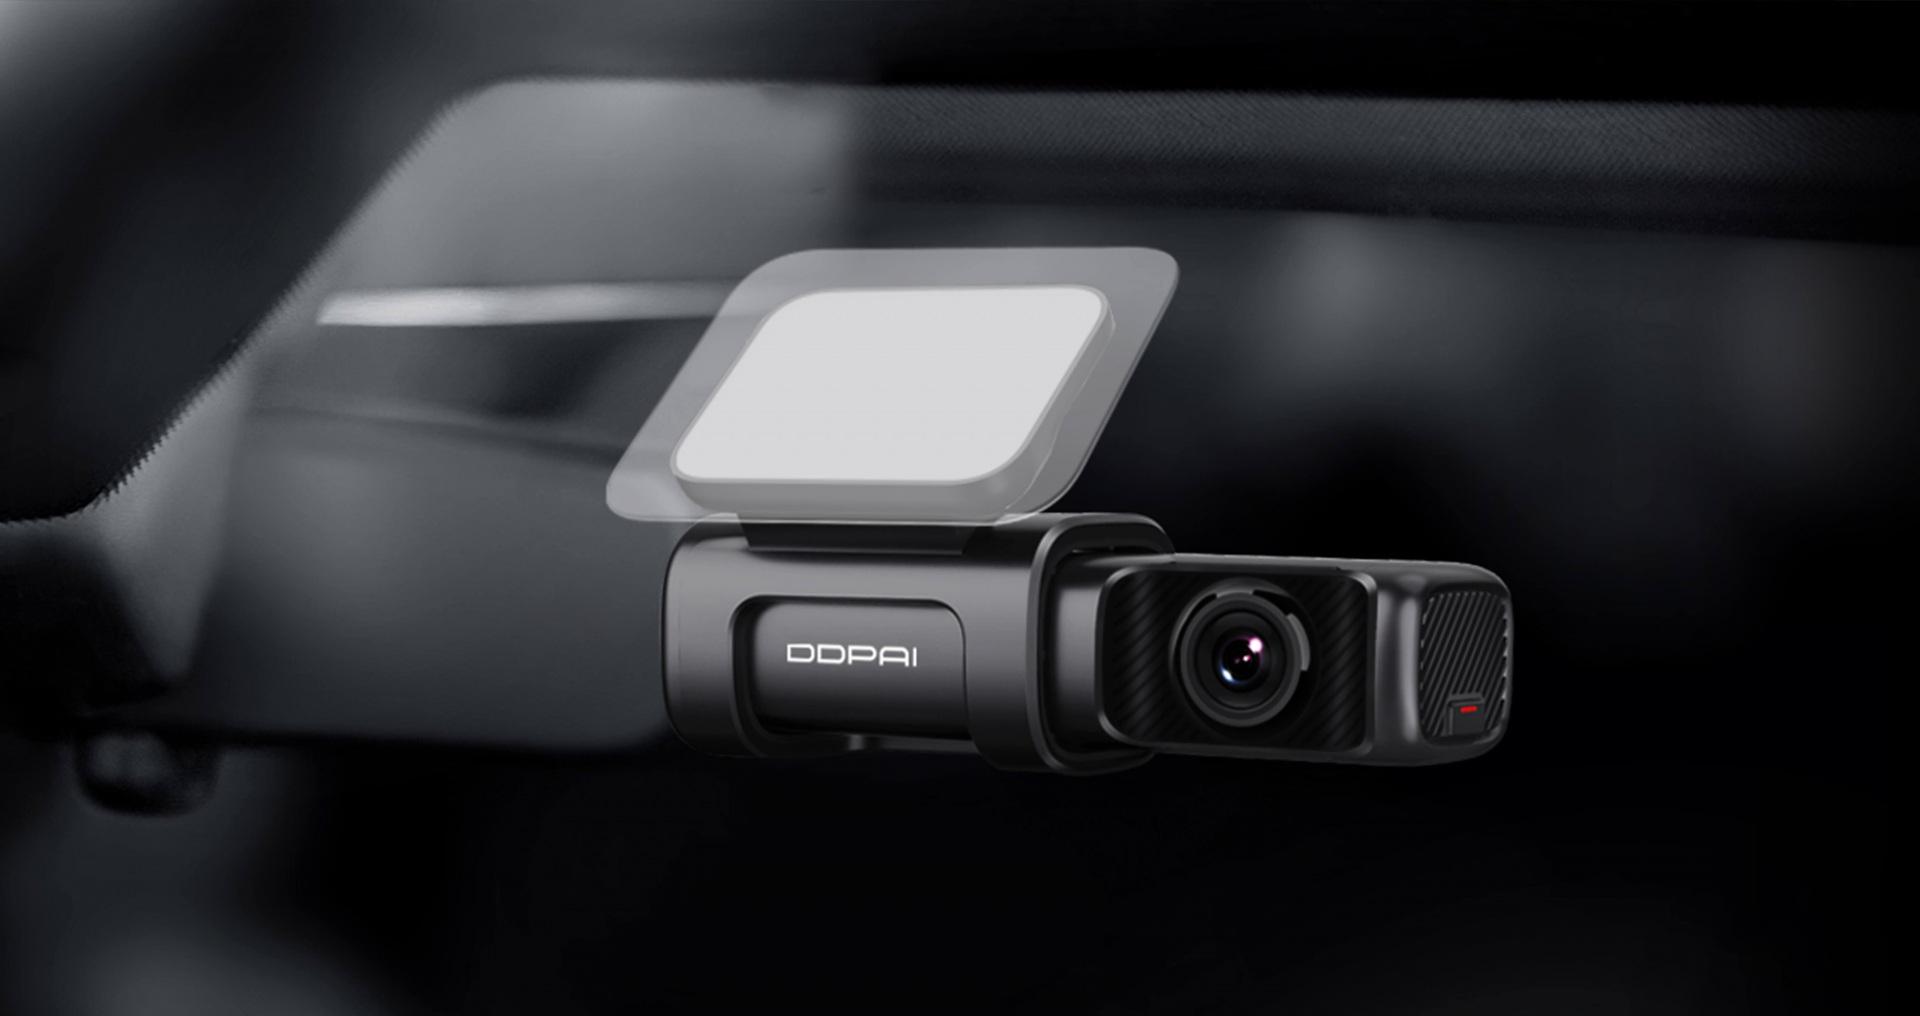 Ddpai mini 5 Camera hành trình 4K